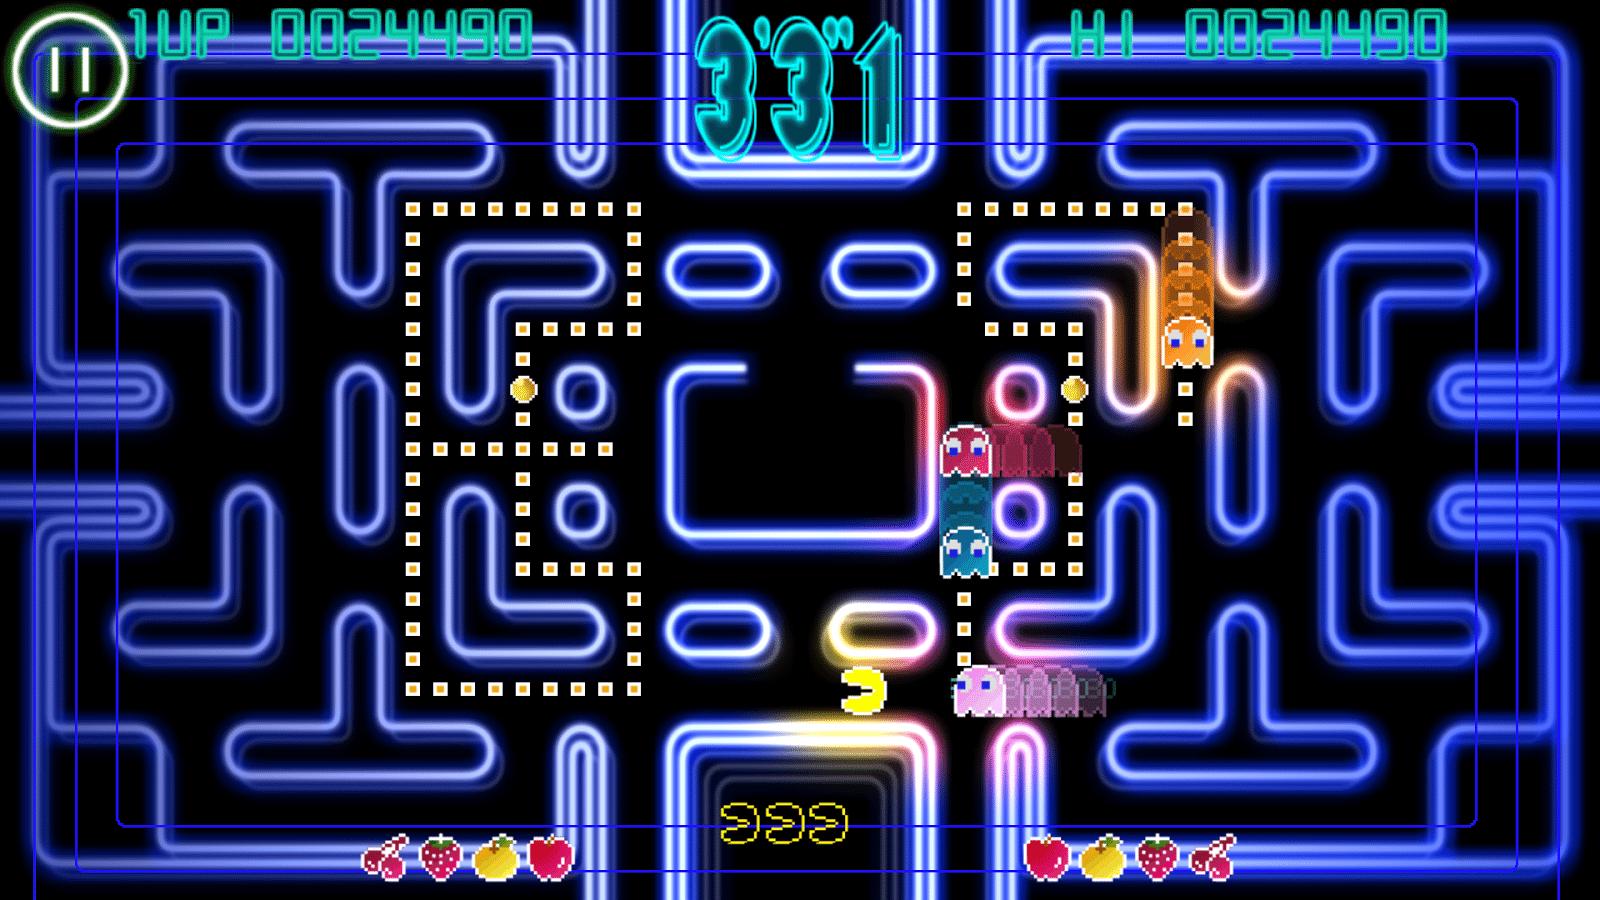 PAC-MAN 256 per dispositivi mobili, lo annuncia Bandai Namco